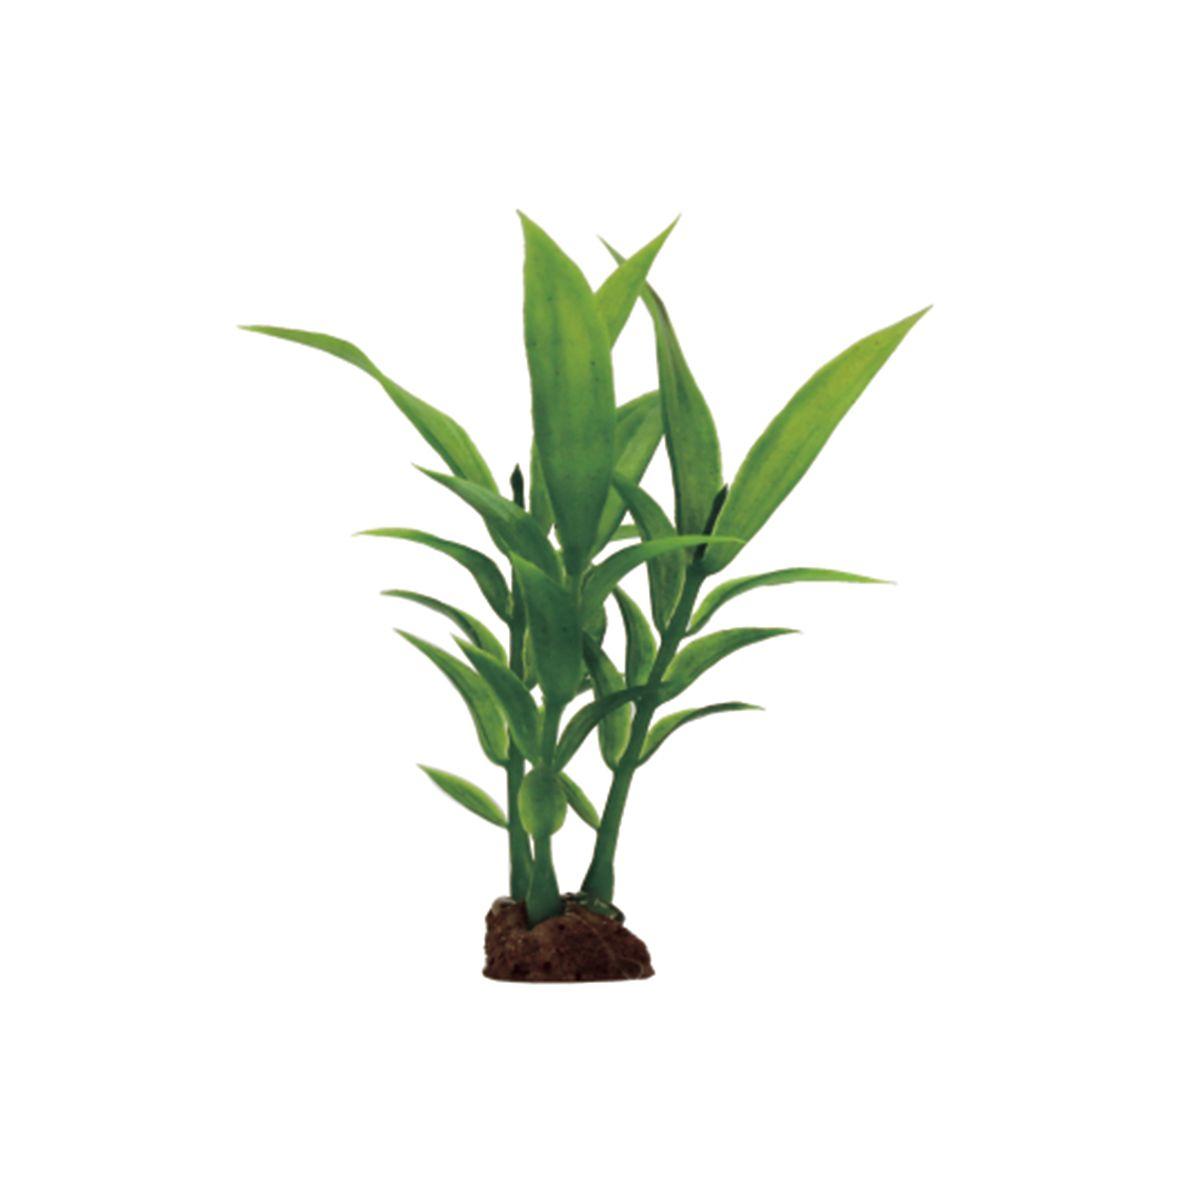 Растение для аквариума ArtUniq Гигрофила сиамская, высота 10 см, 6 штART-1170516Растение для аквариума ArtUniq Гигрофила сиамская, высота 10 см, 6 шт